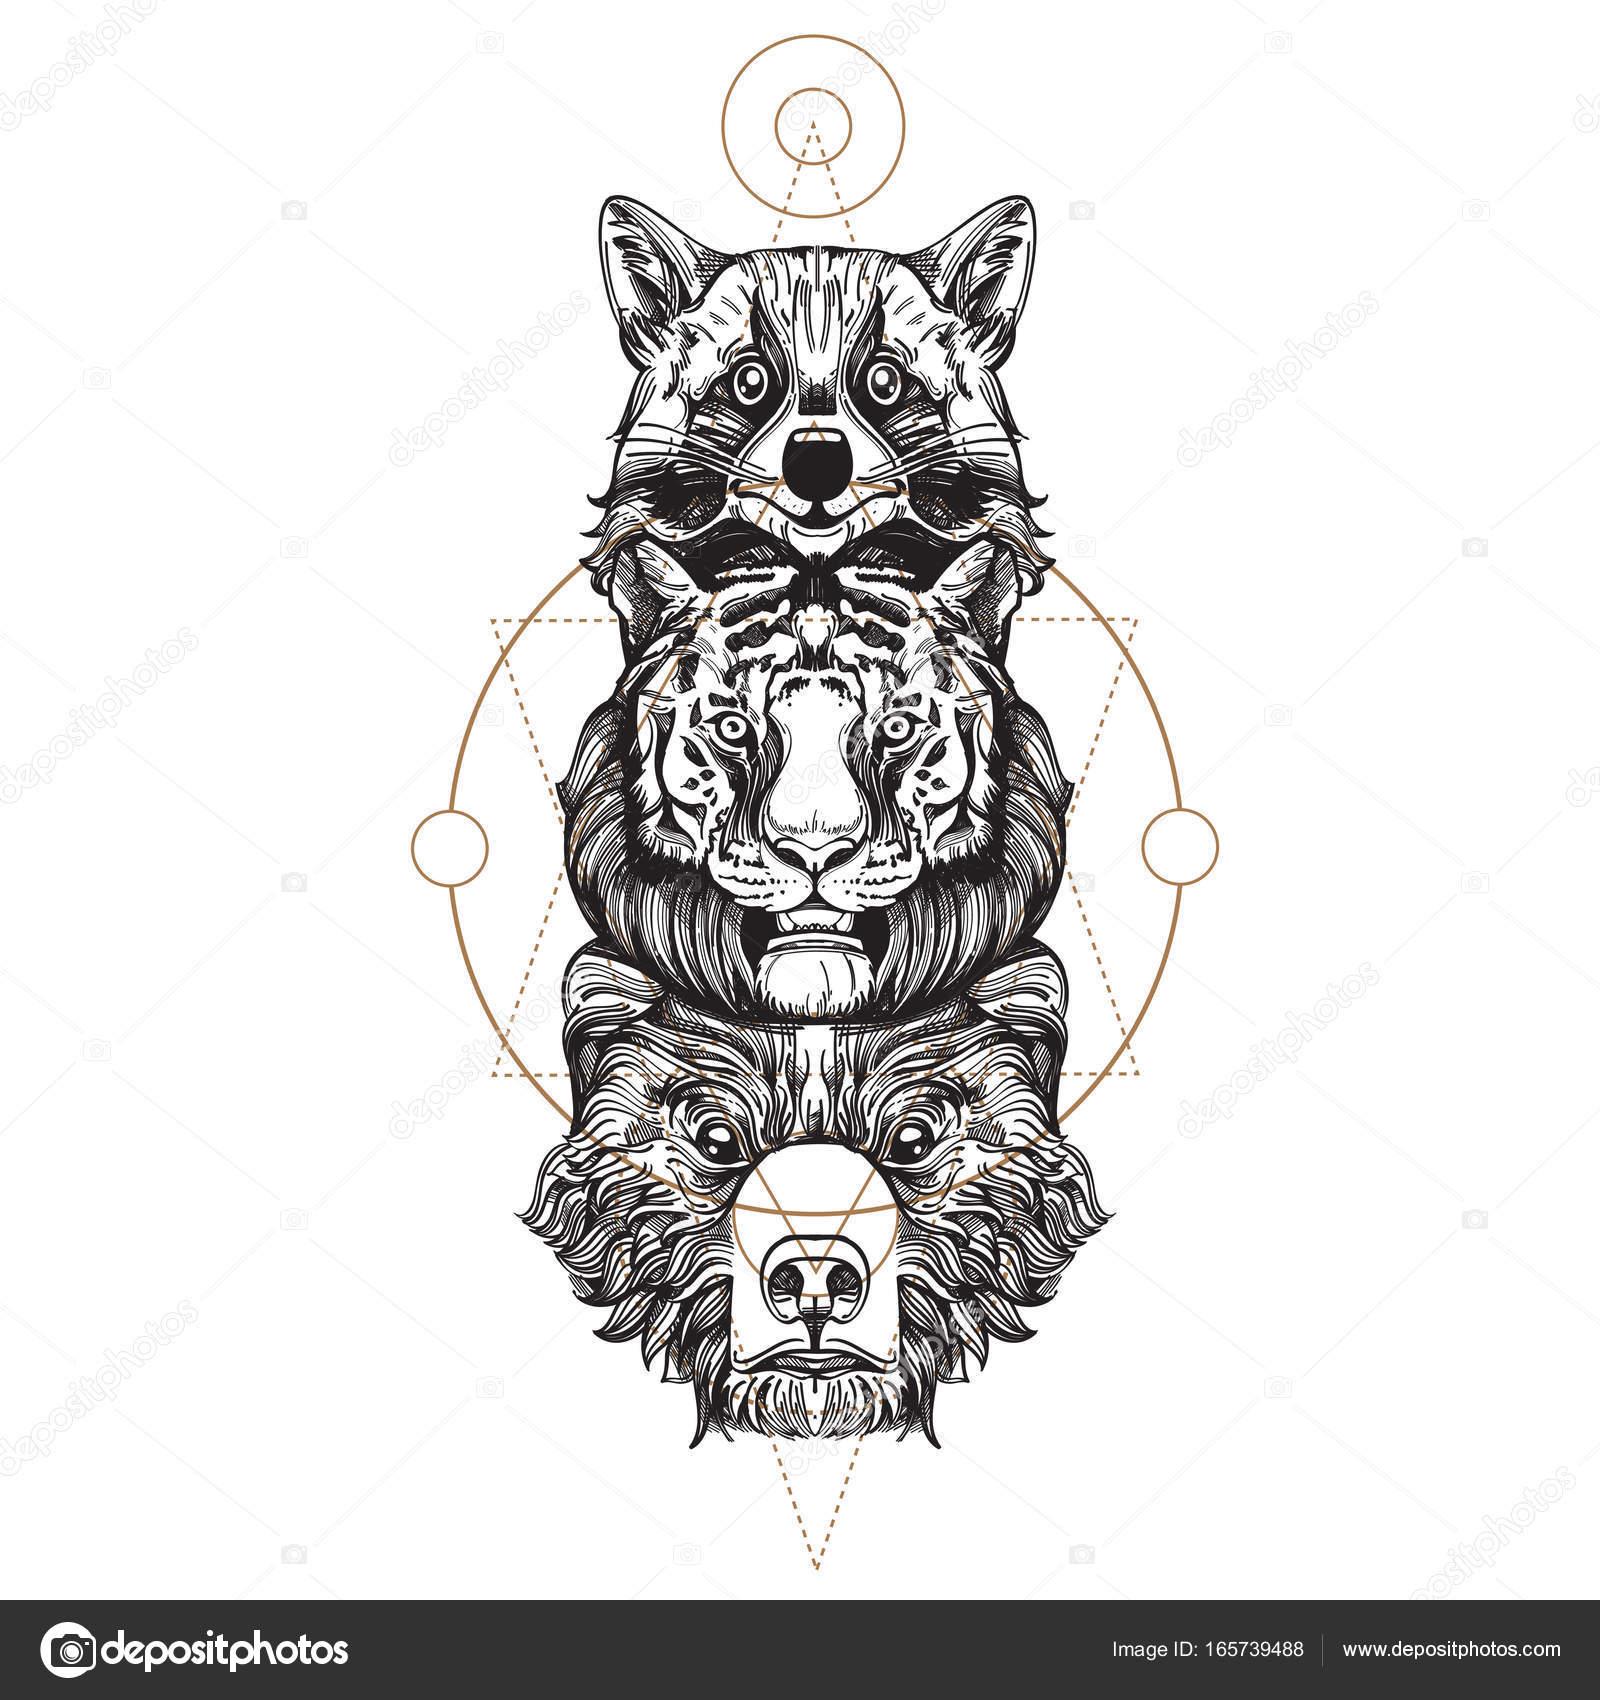 Dibujos Bocetos De Osos Mapache Tigre Y Oso Totem